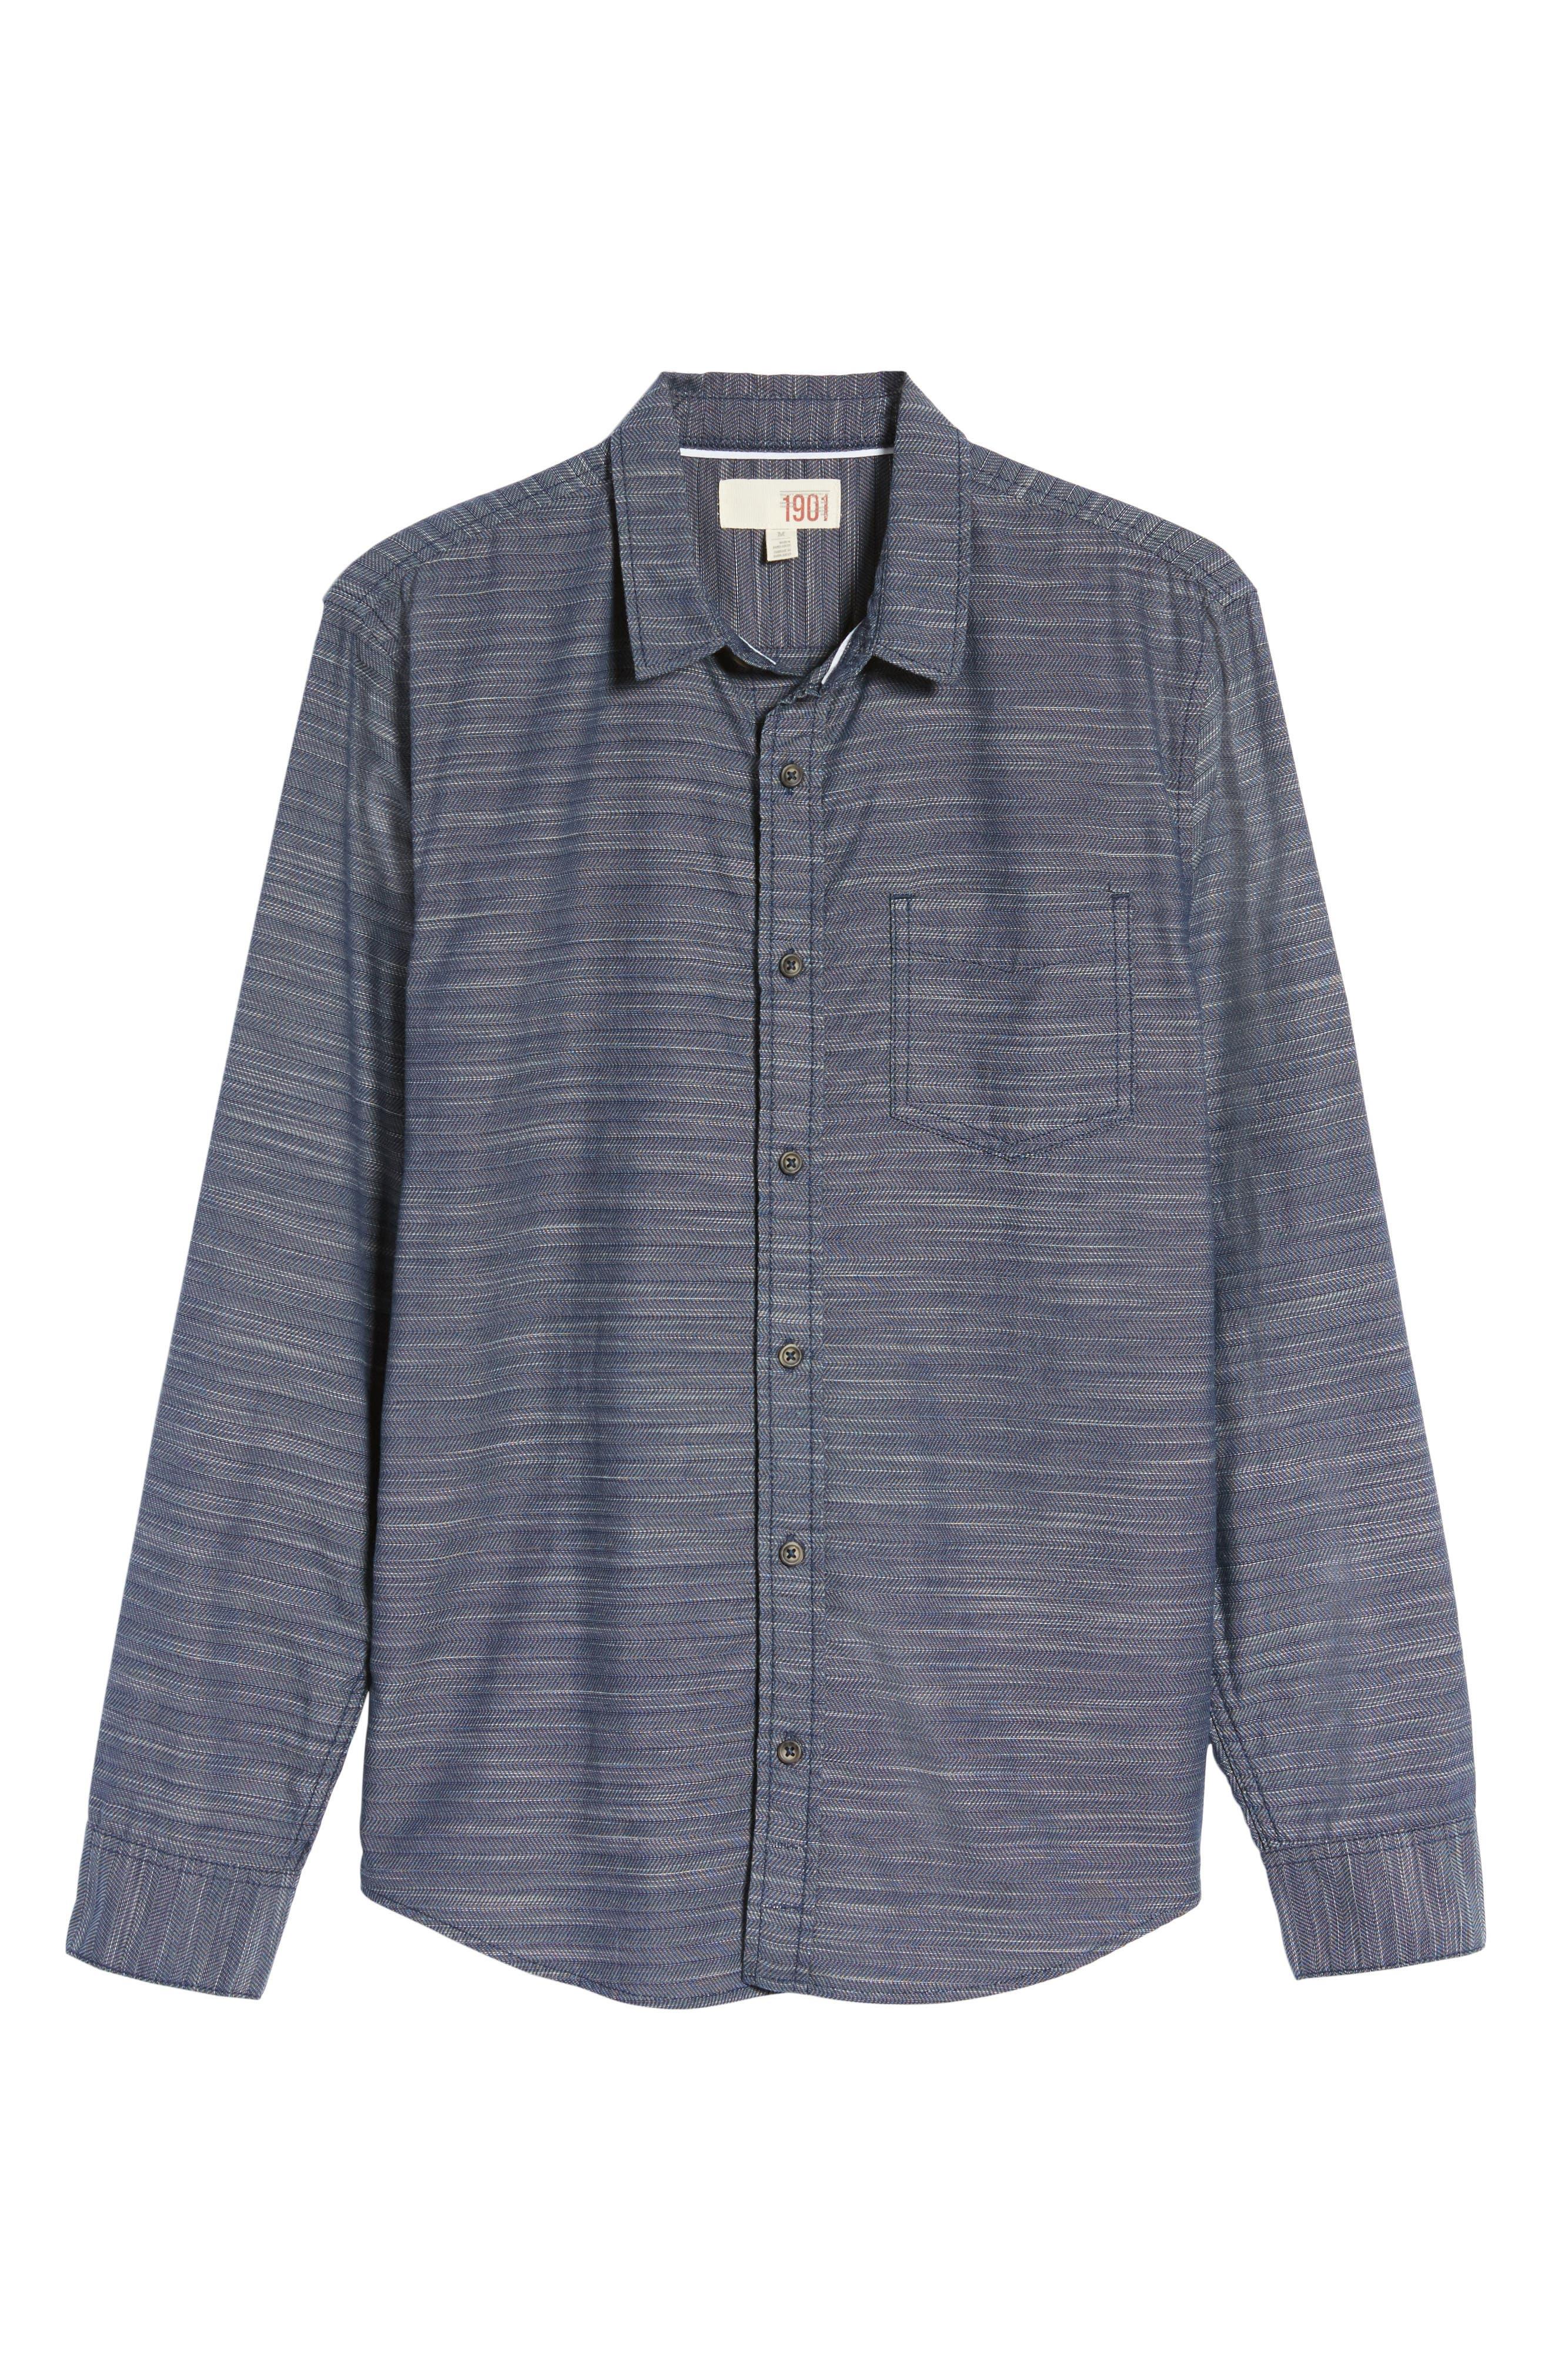 Herringbone Chambray Shirt,                             Alternate thumbnail 6, color,                             Navy Charcoal Herringbone